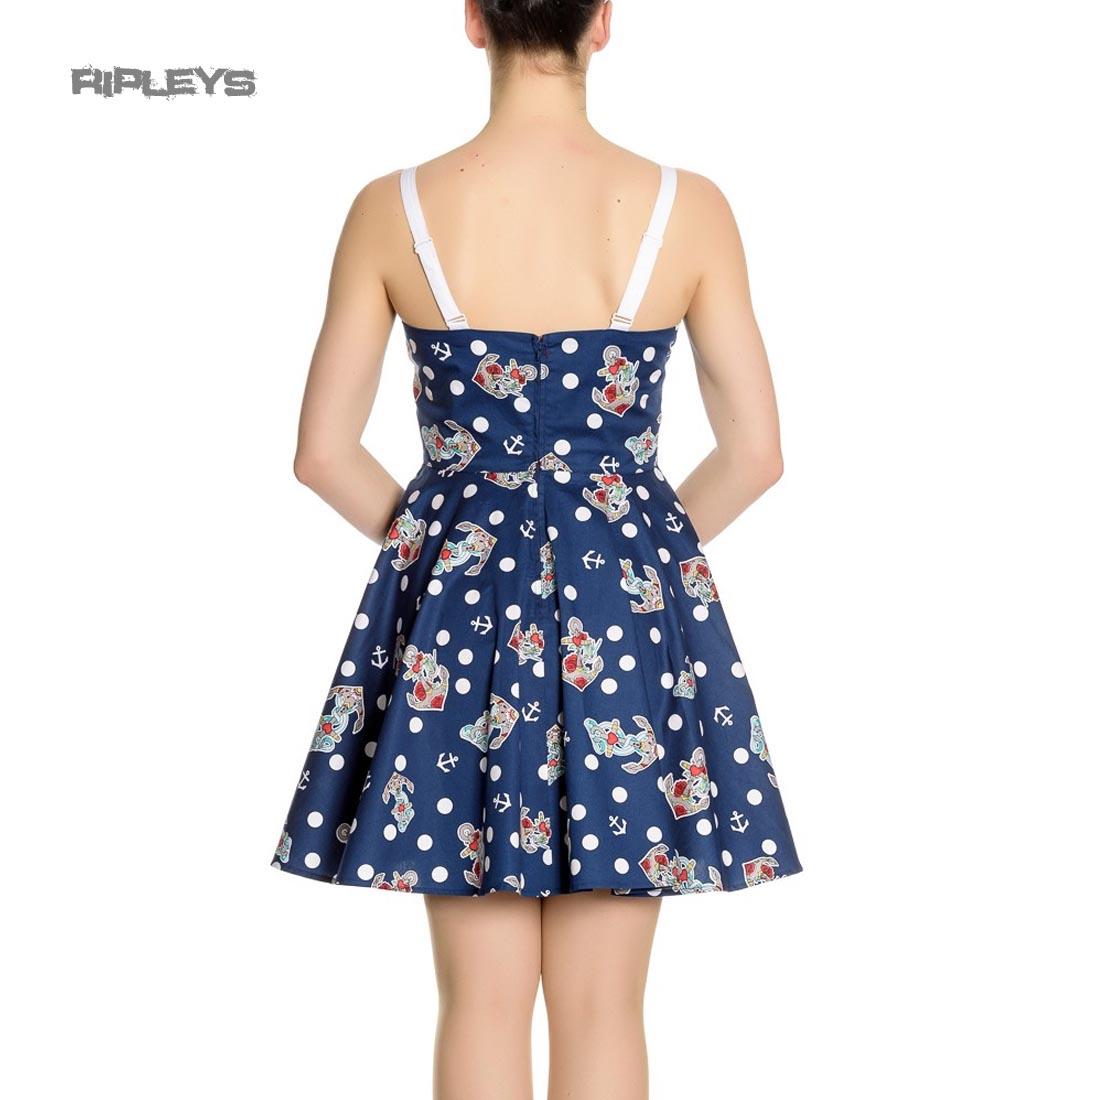 Hell-Bunny-Navy-Blue-50s-Nautical-Mini-Dress-OCEANA-Polka-Dot-All-Sizes thumbnail 24